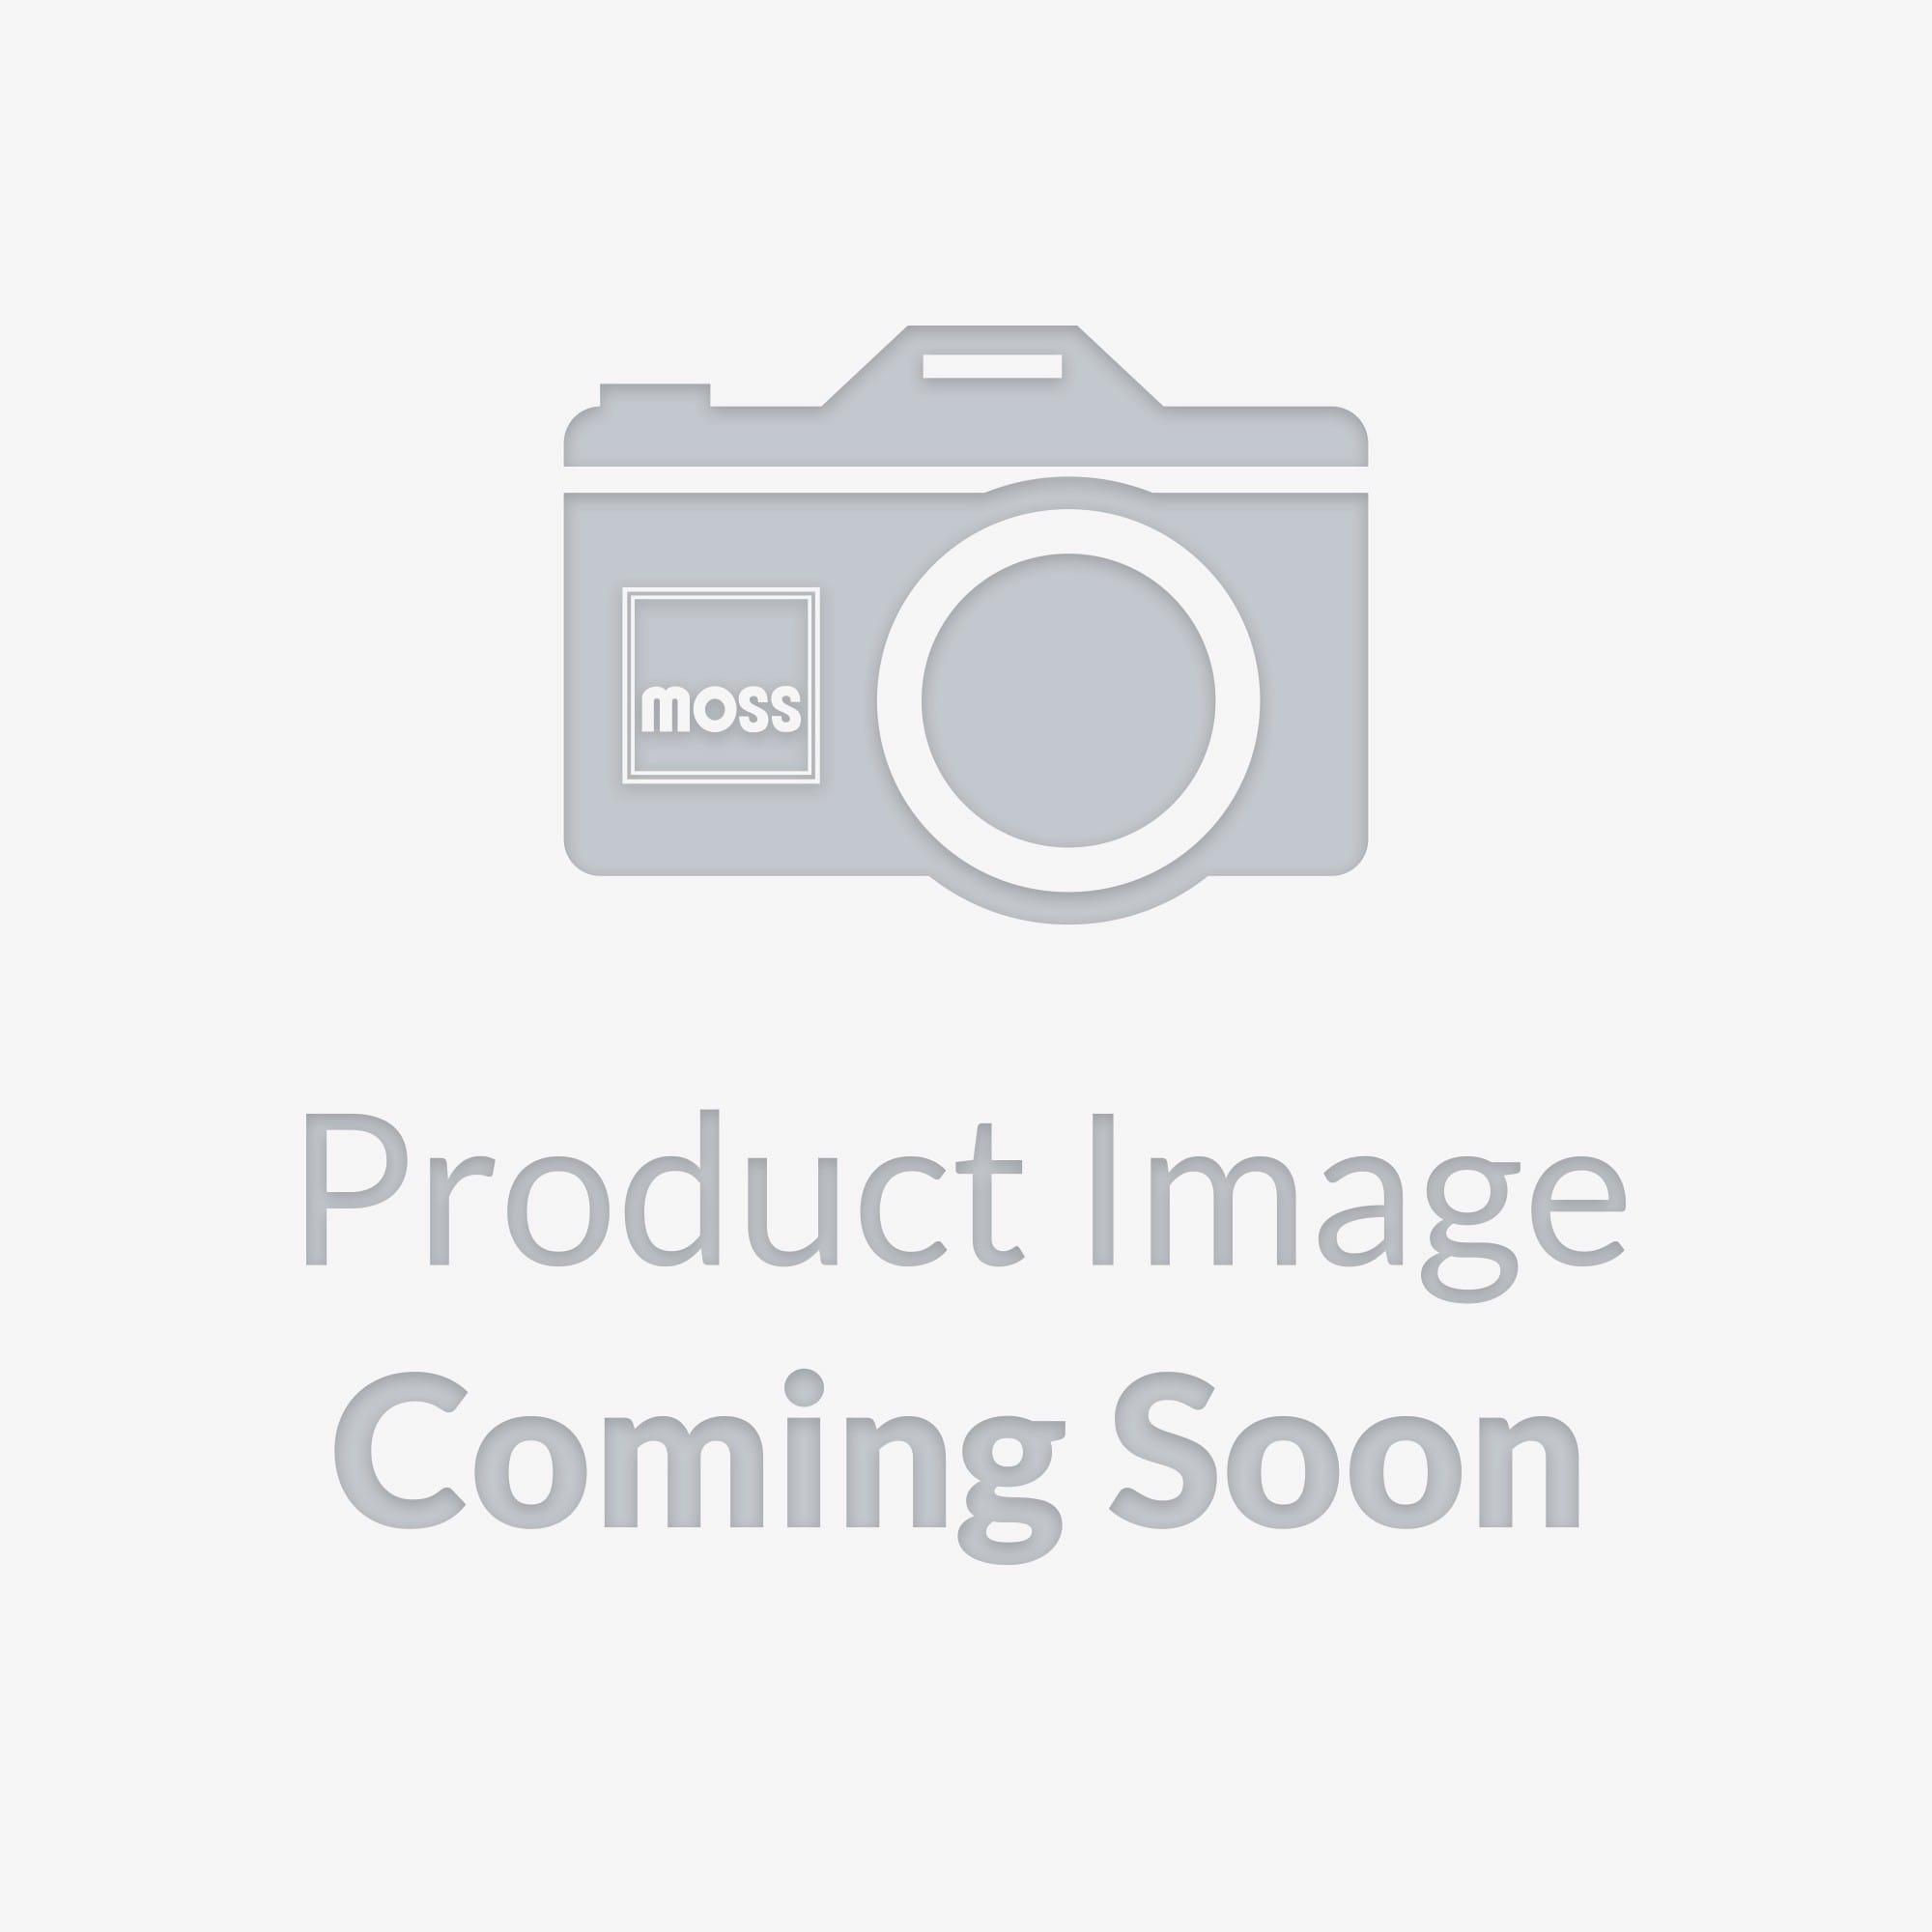 021 573 Heater Control Valve Moss Motors